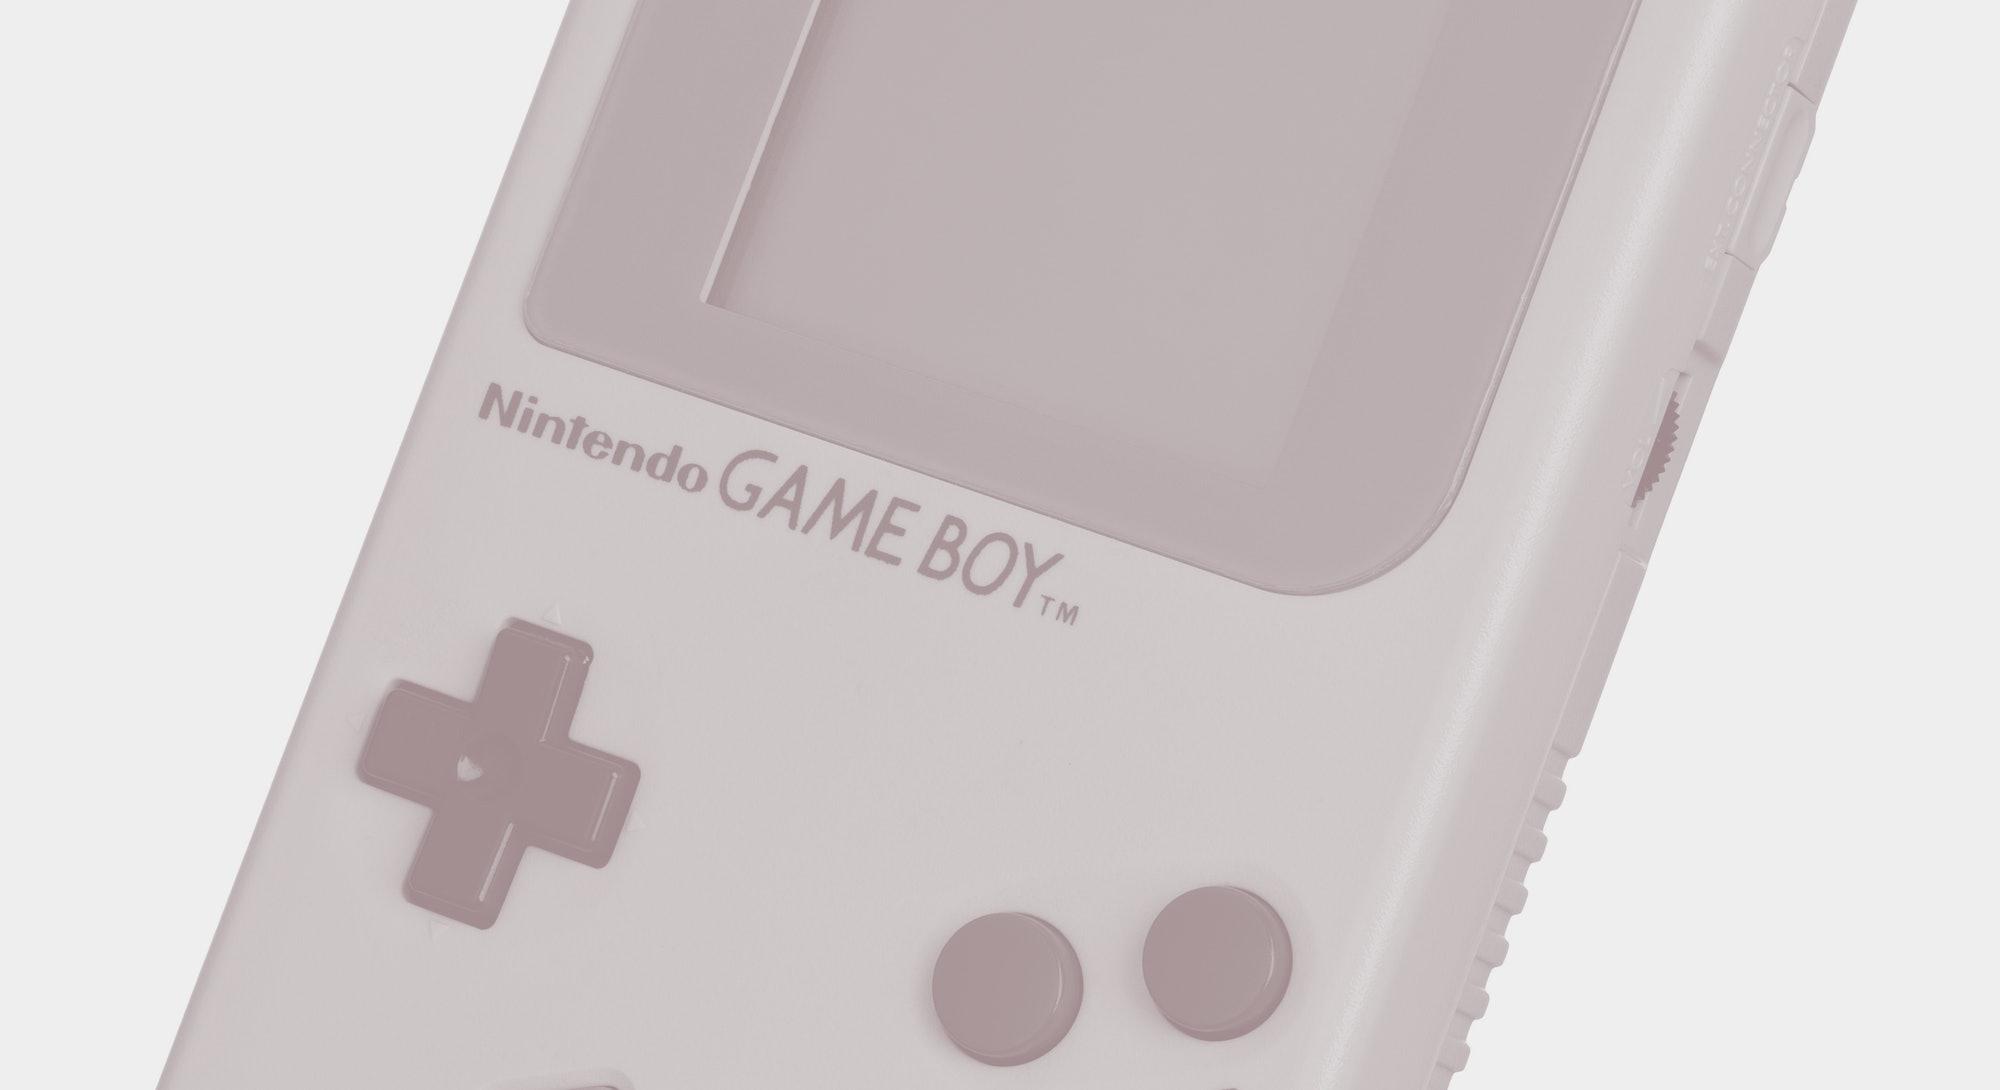 Game Boy classic. YouTube. YouTuber. Games. Gaming. Video Games. Tetris. Hacking. Mod. Modding.